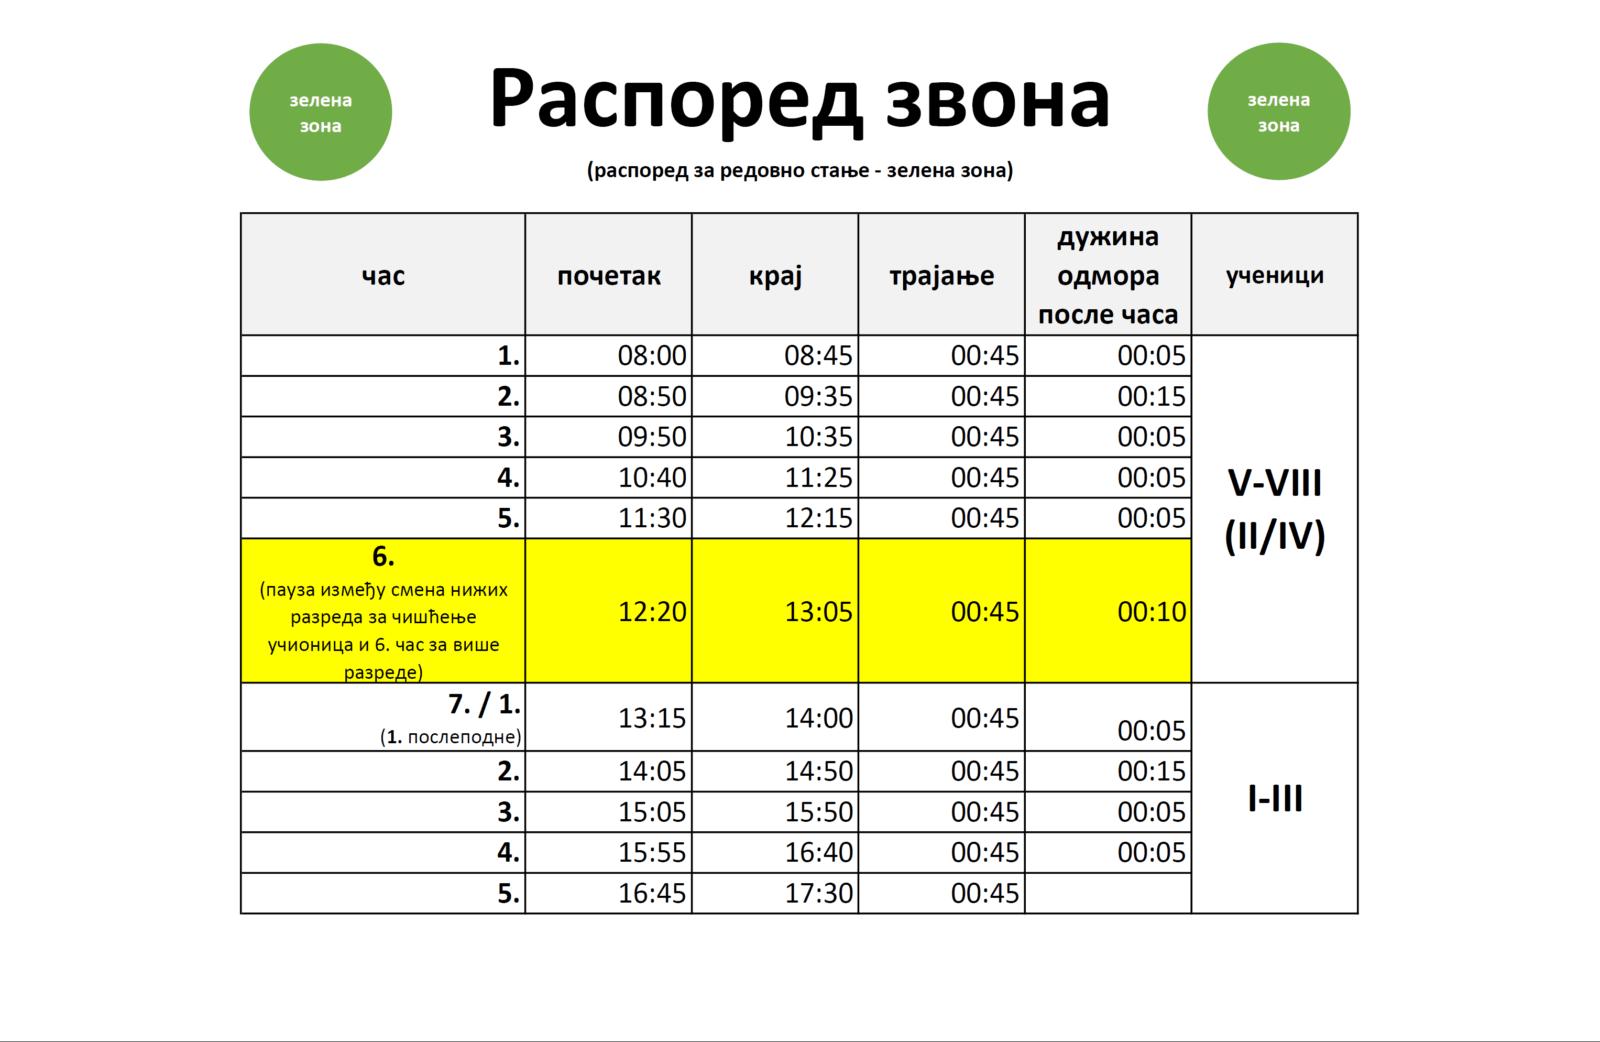 Распоред звона